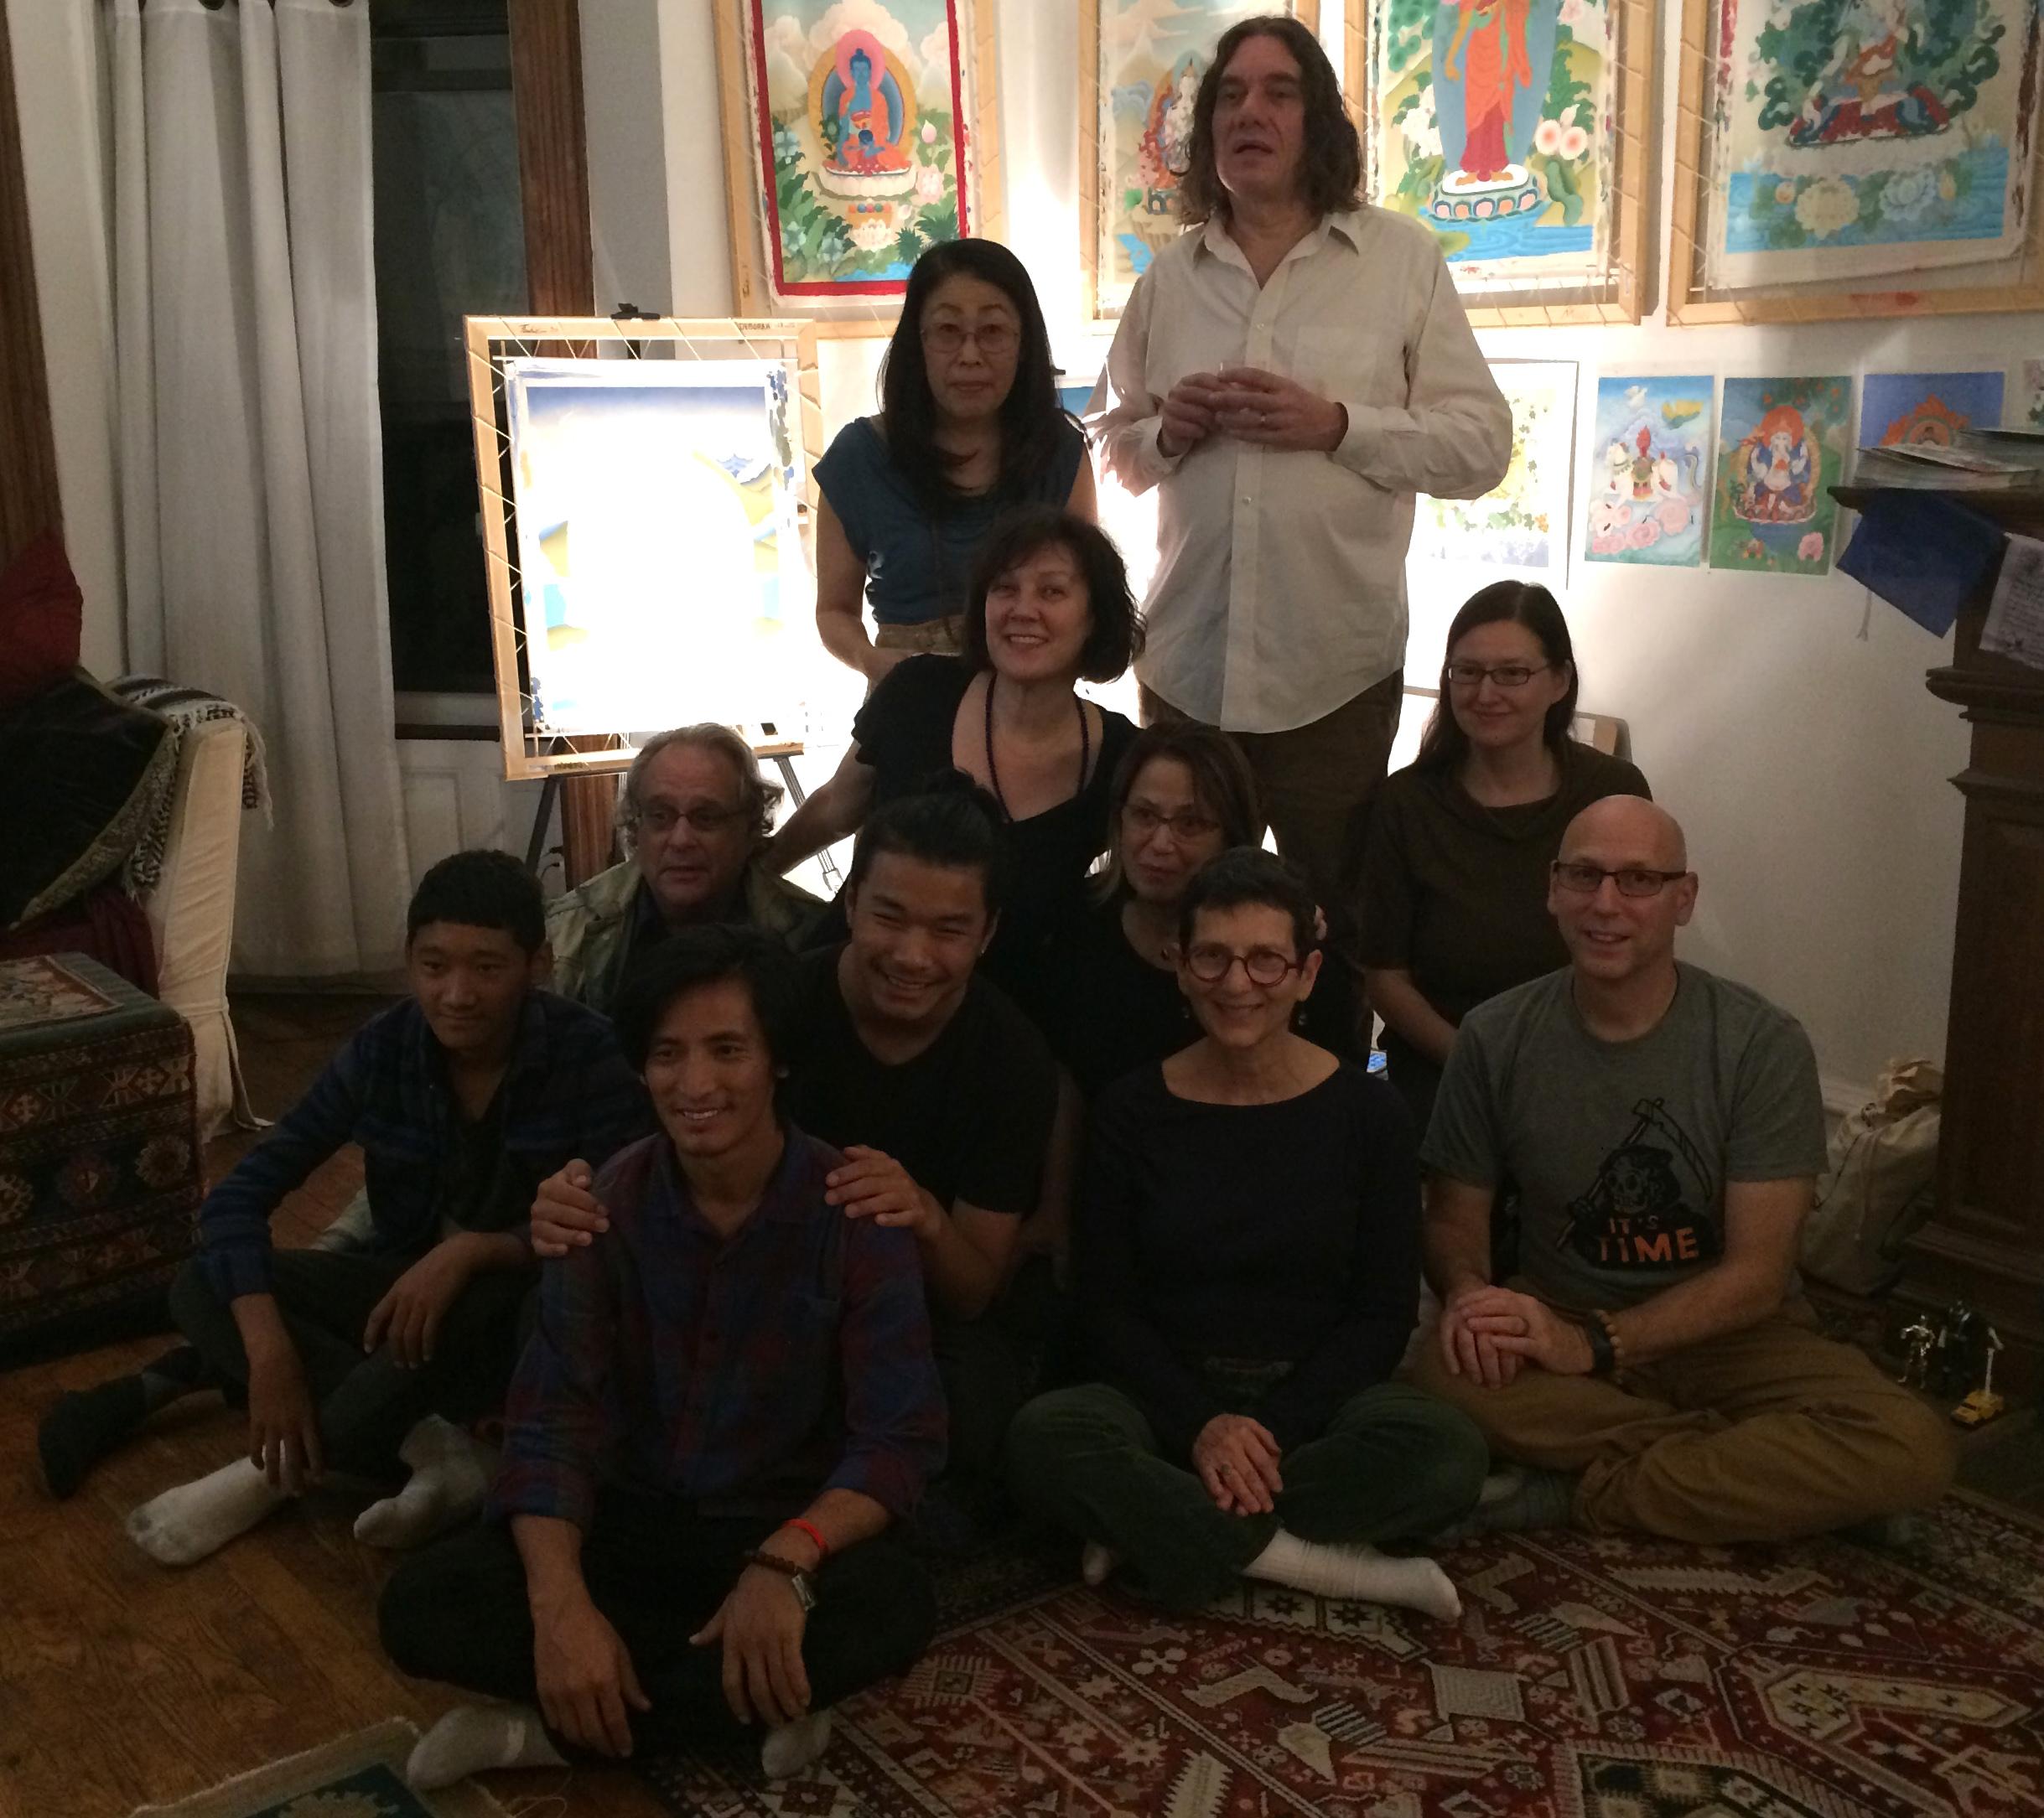 Celebrating three years of Thangka classes with Sonam Rinzin, October 2017